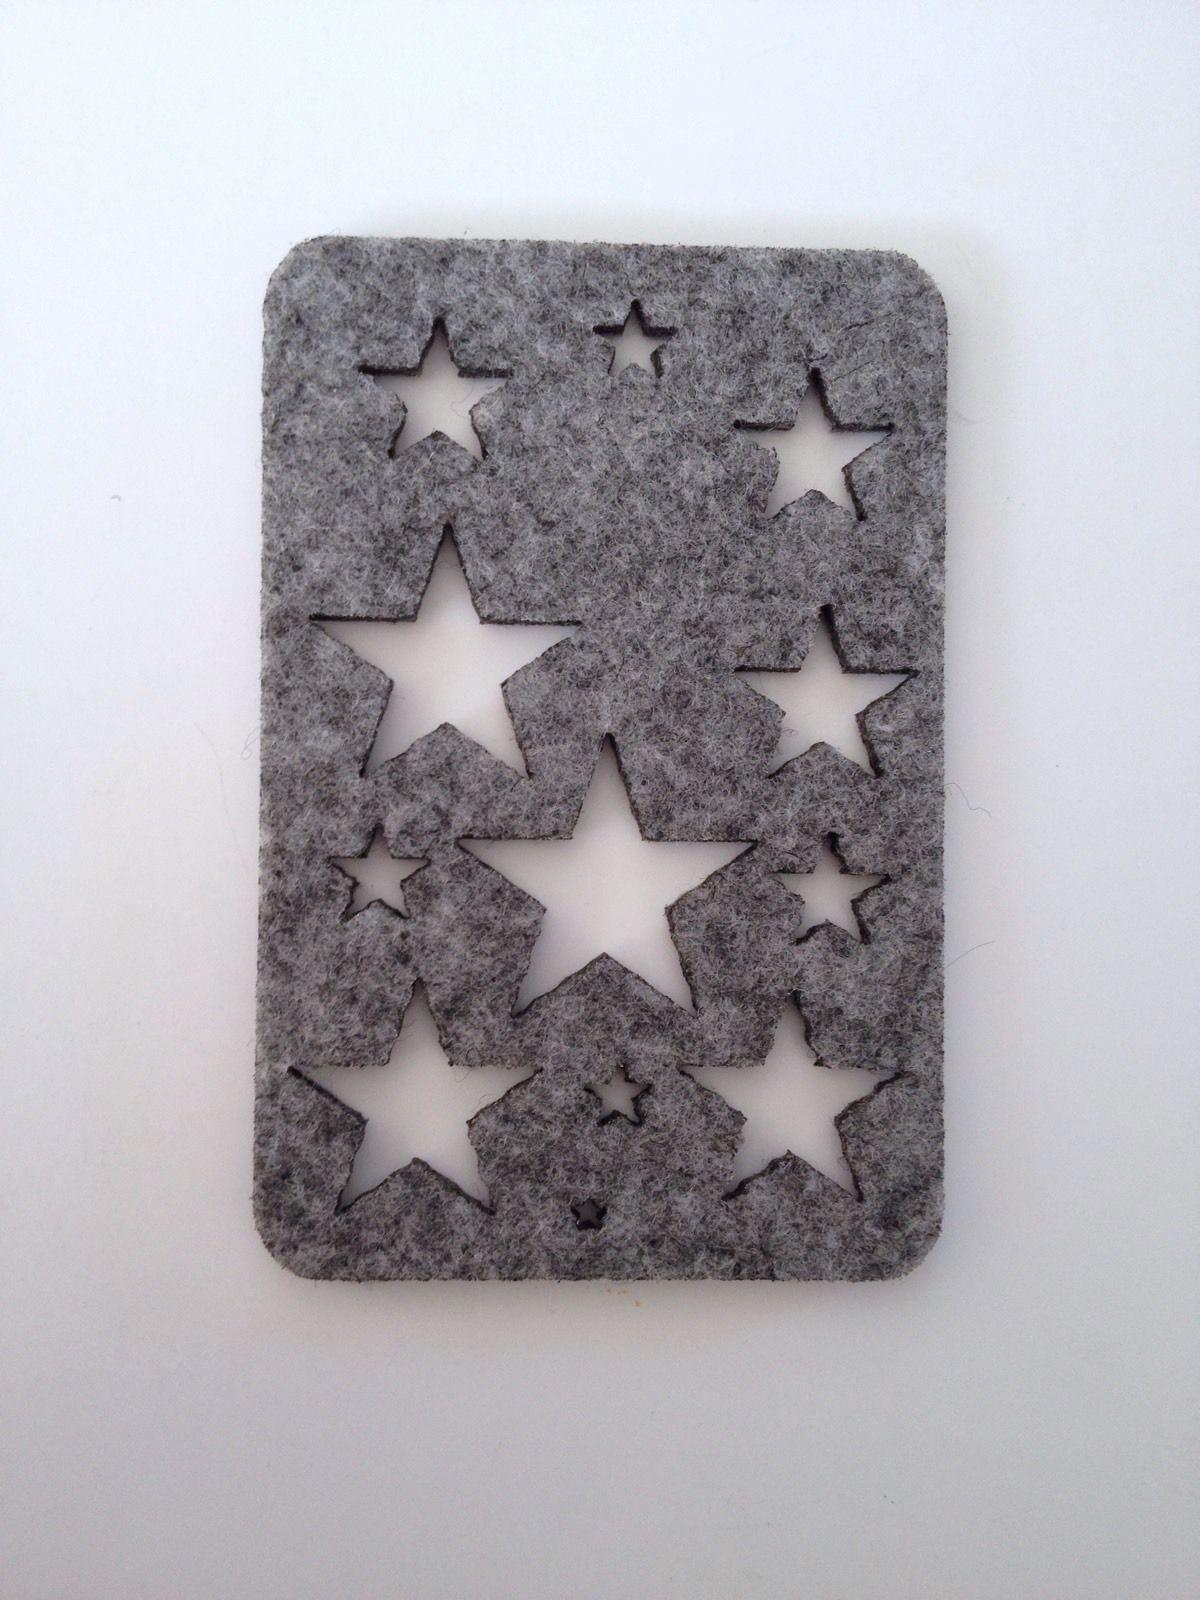 New Star Stencil Stencils Tools Supplies Paint Quilling Art Felt ...